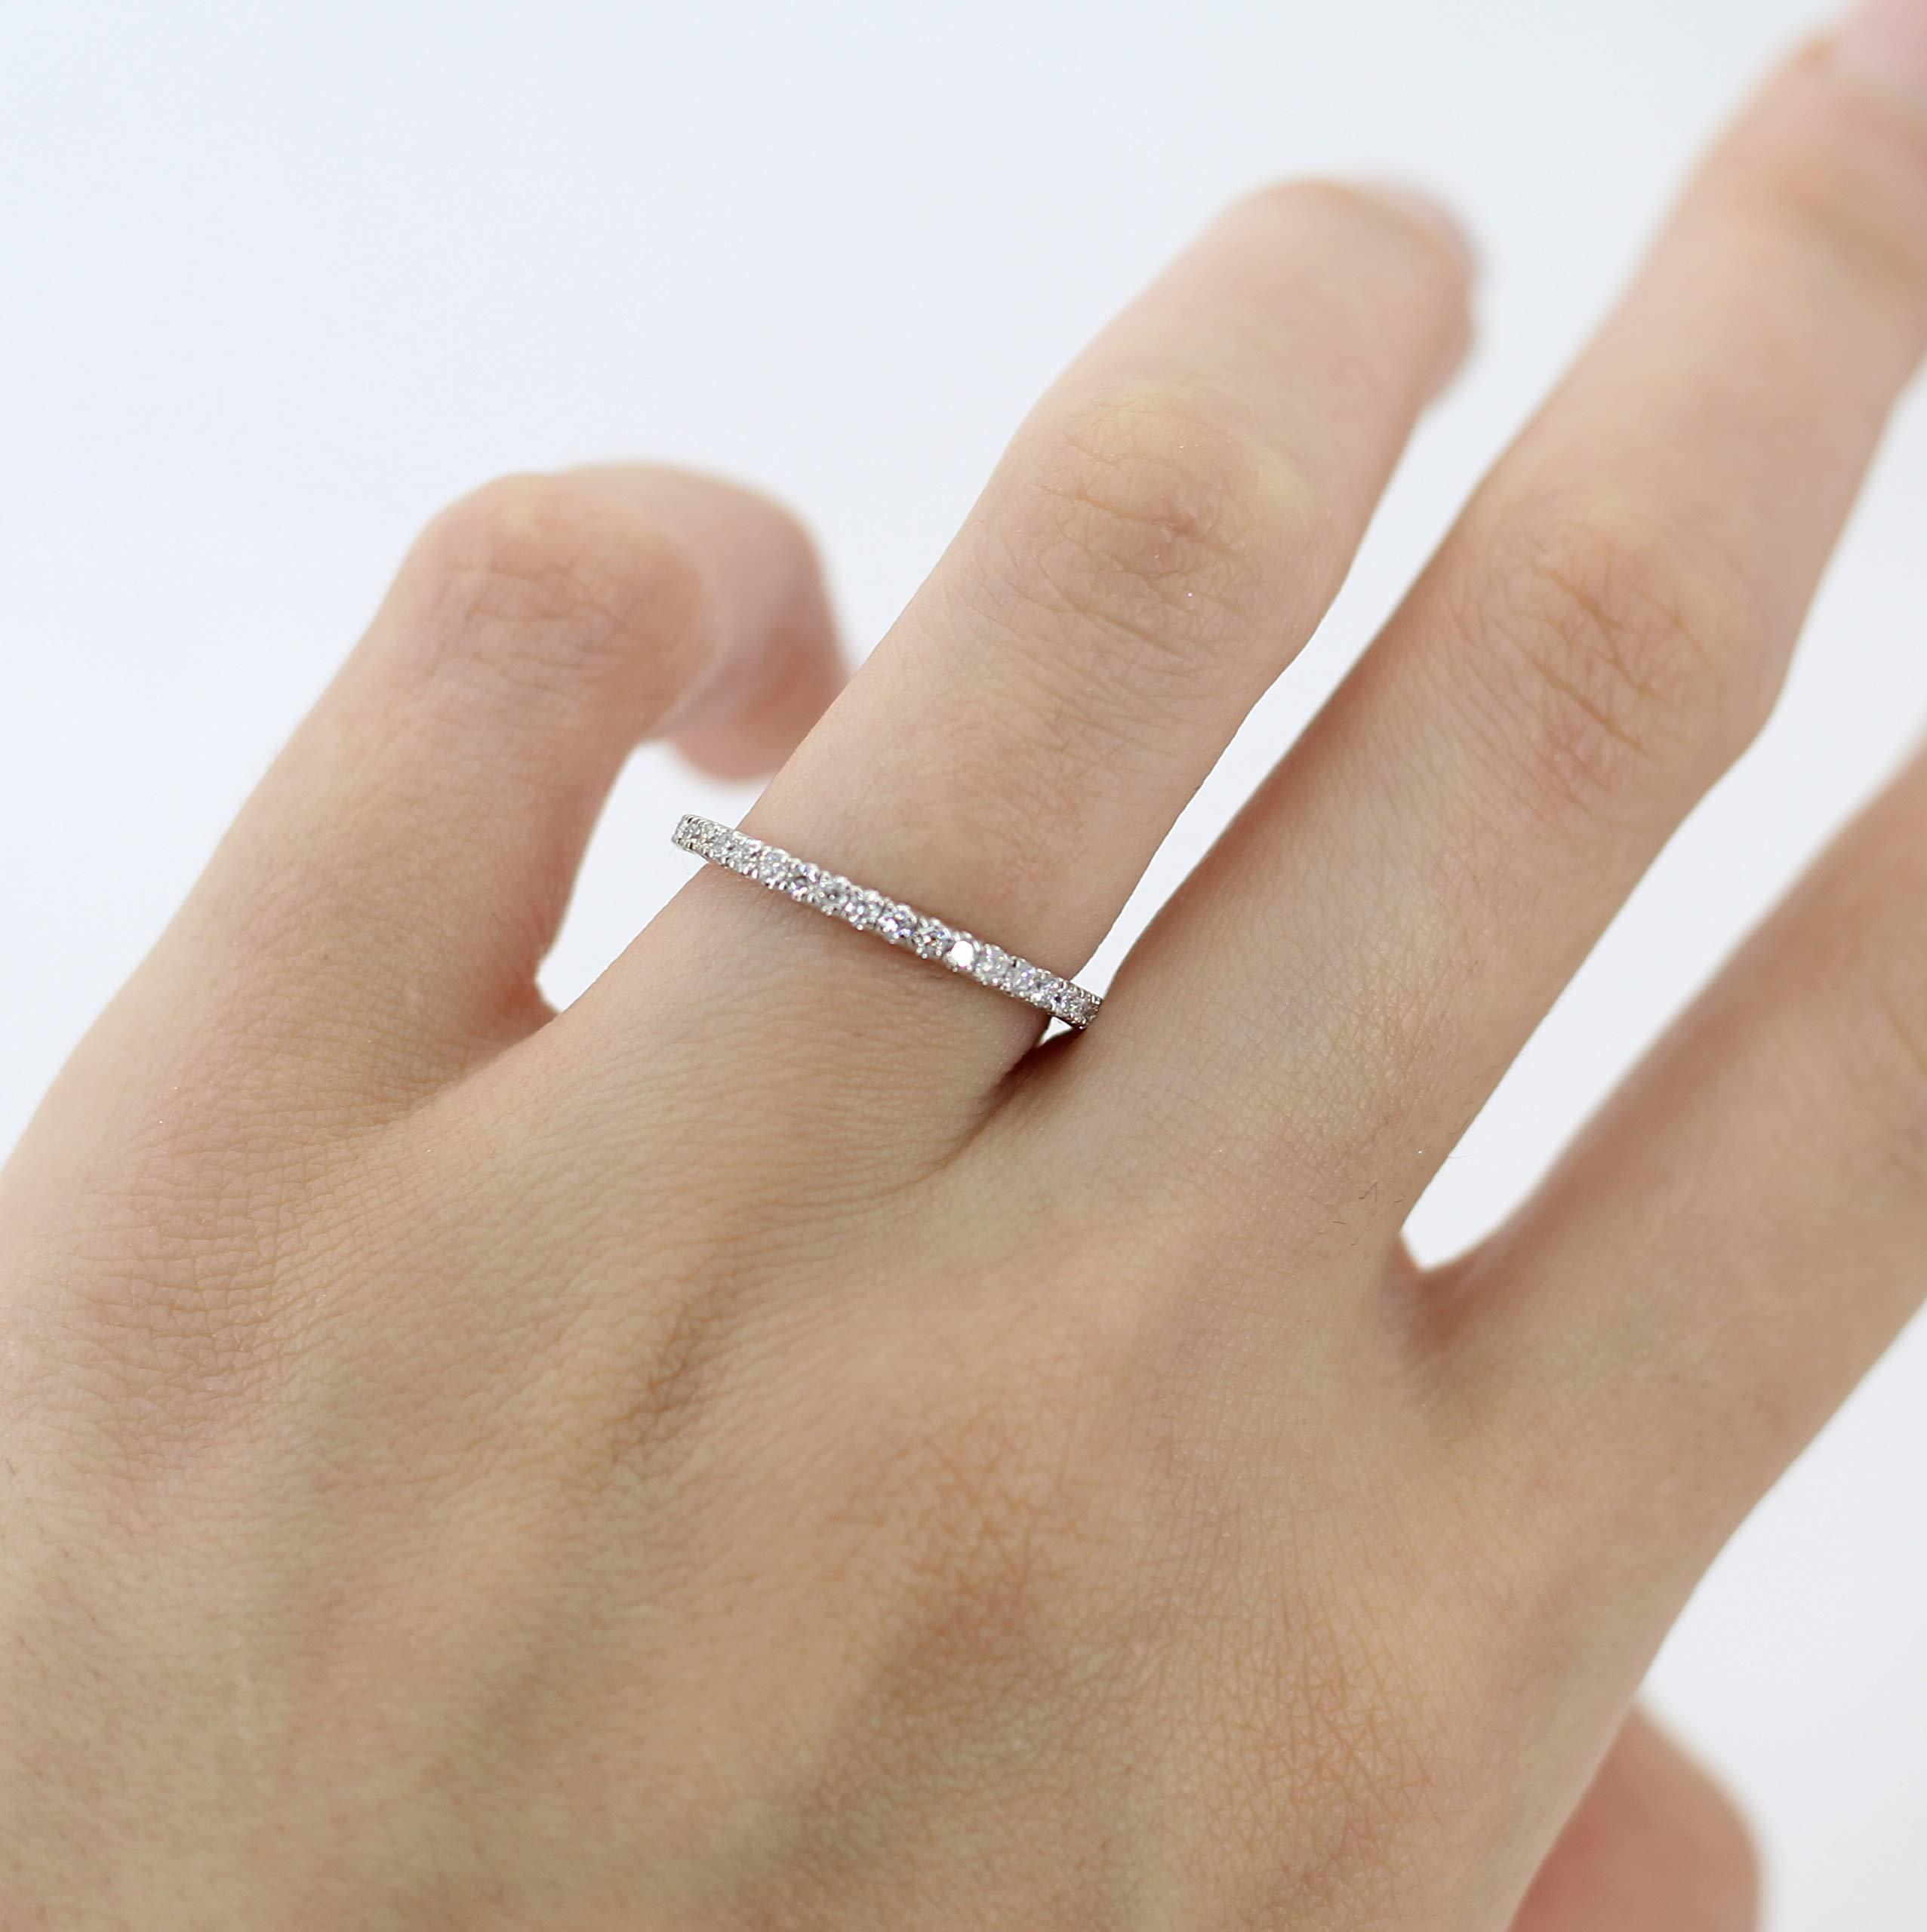 Diamond Eternity Wedding Band for Women Pave Set Diamond Bridal Ring in Palladium